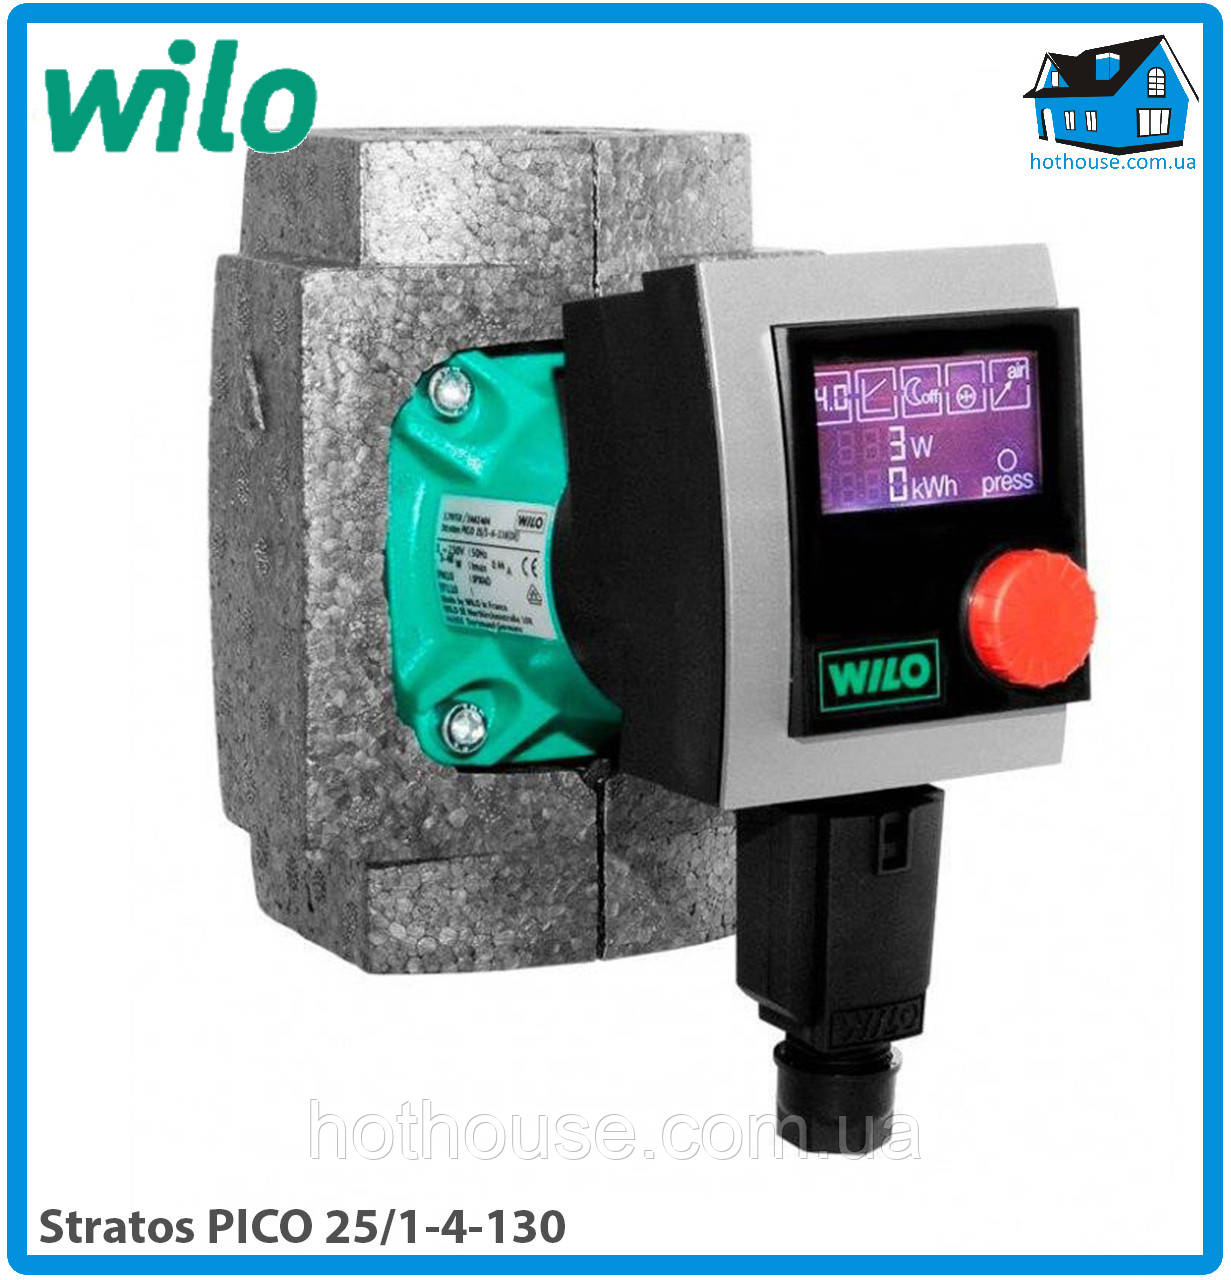 Насос циркуляционный Wilo Stratos PICO 25/1-4-130 (оригинал)